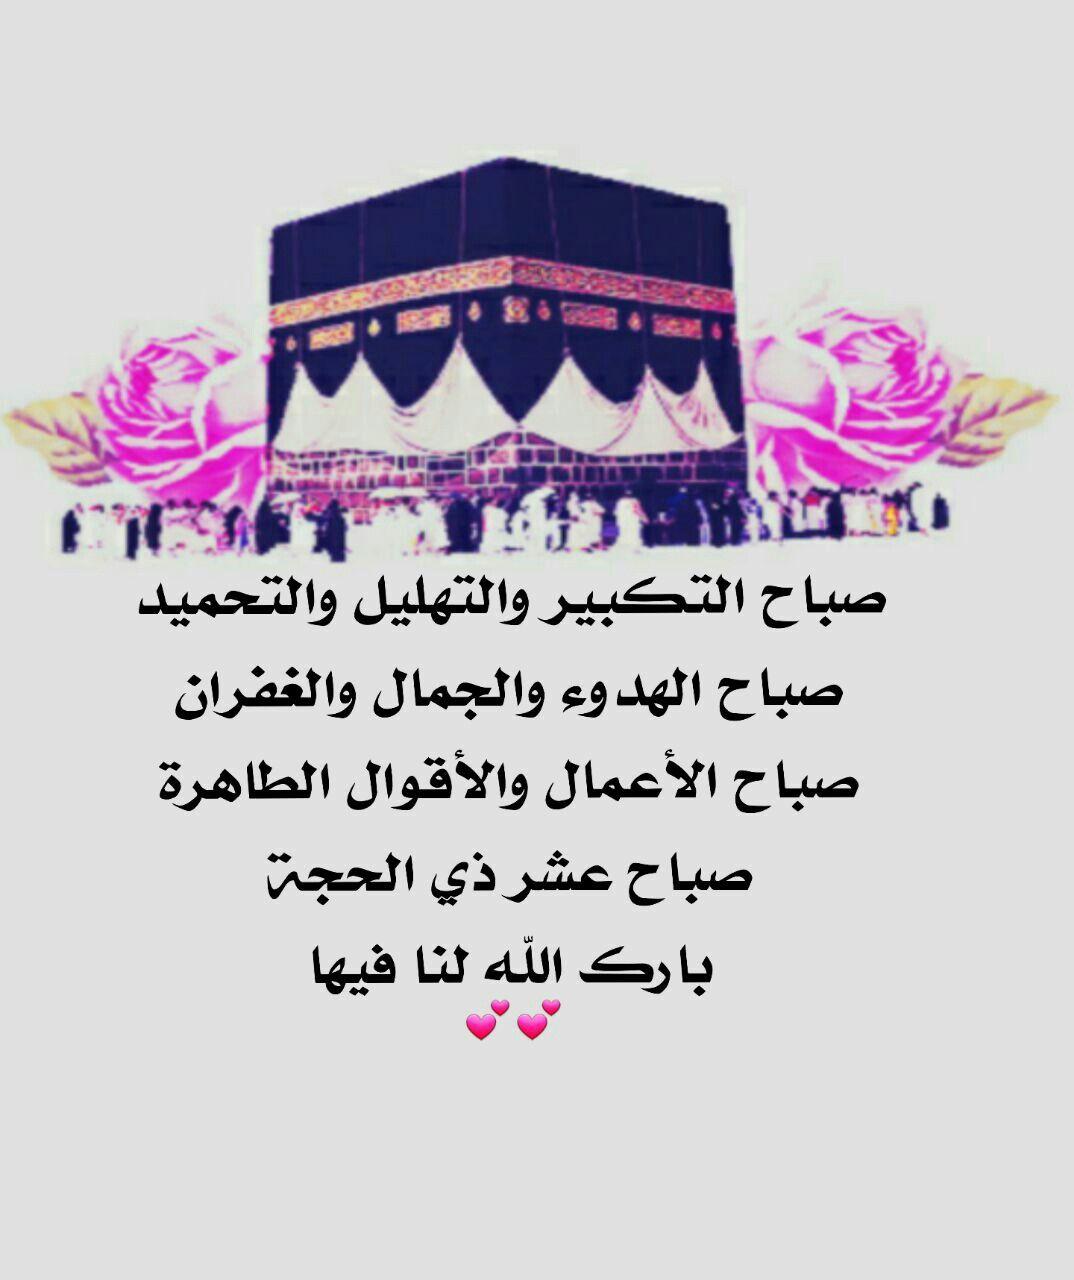 صباح عشر ذي الحجة Islamic Inspirational Quotes Islamic Art Calligraphy Beautiful Morning Messages